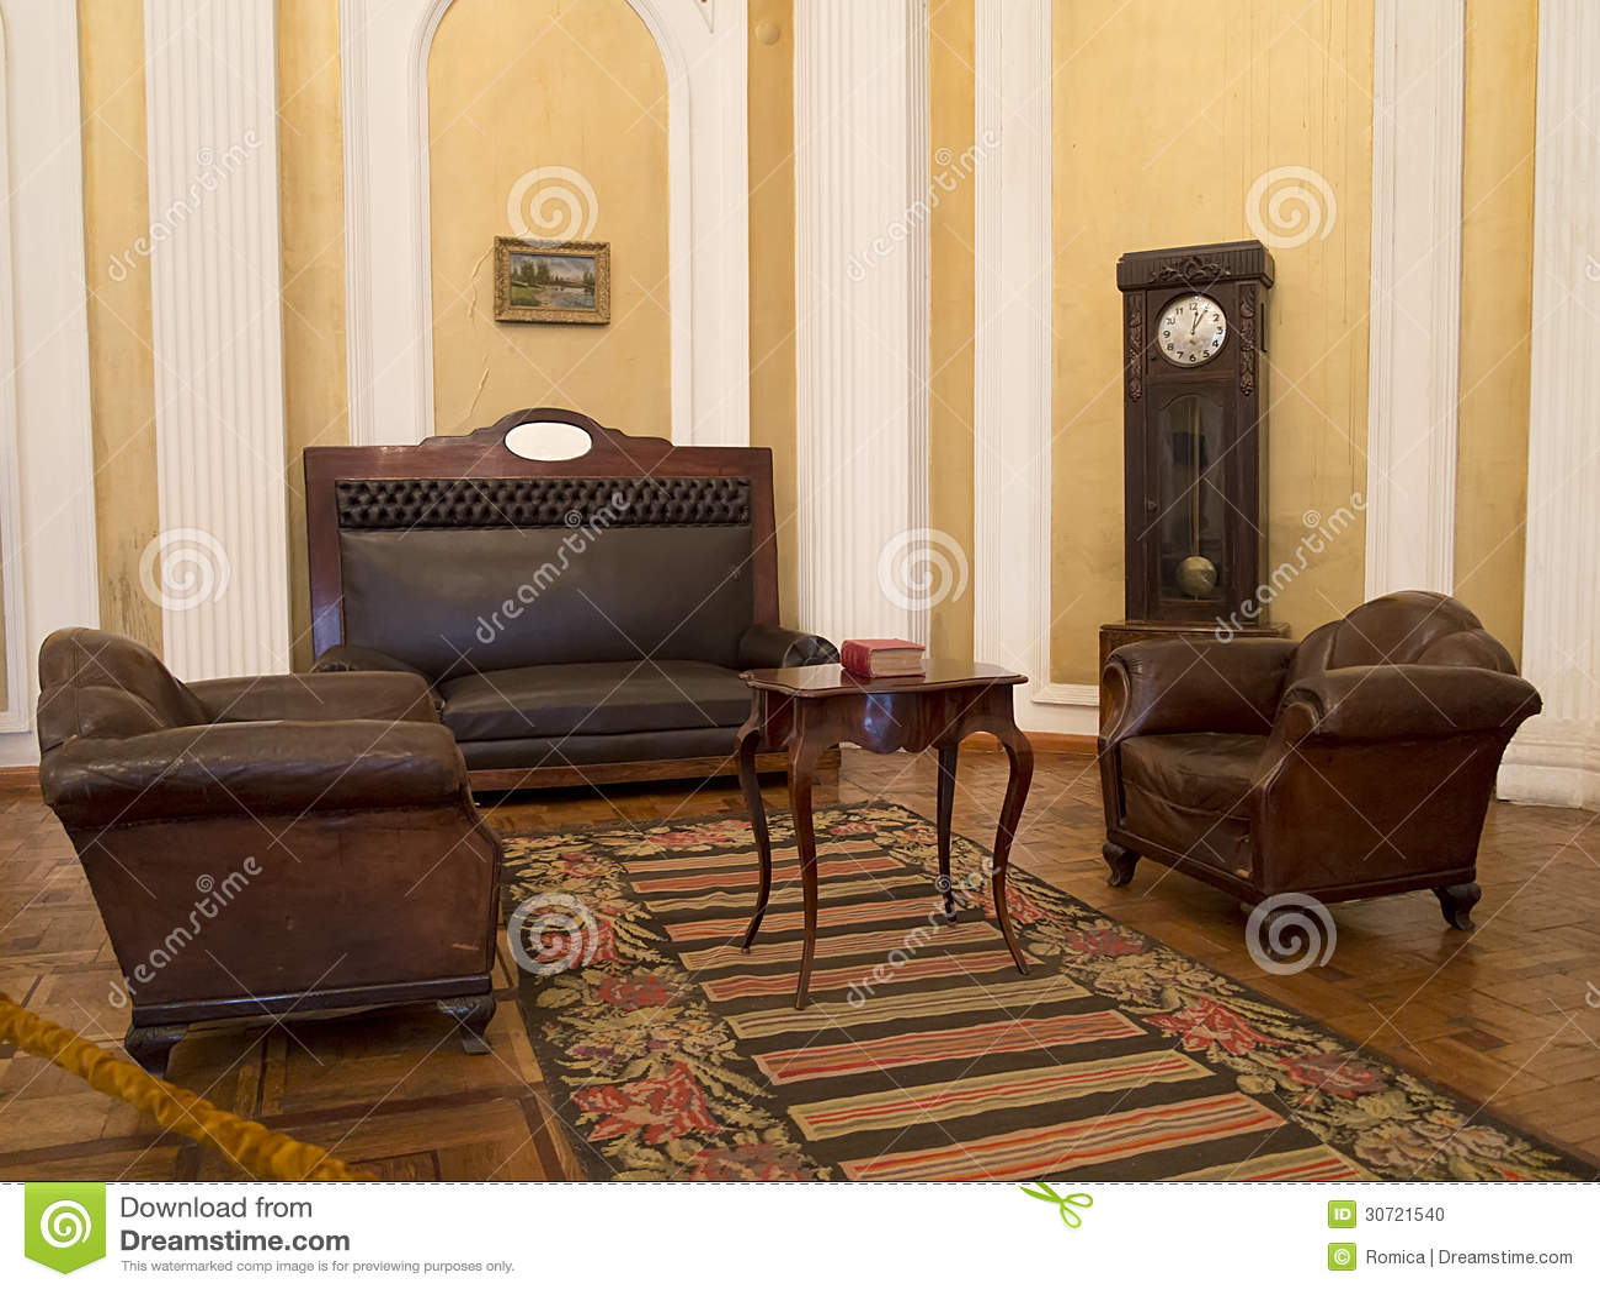 muebles siglo xix: